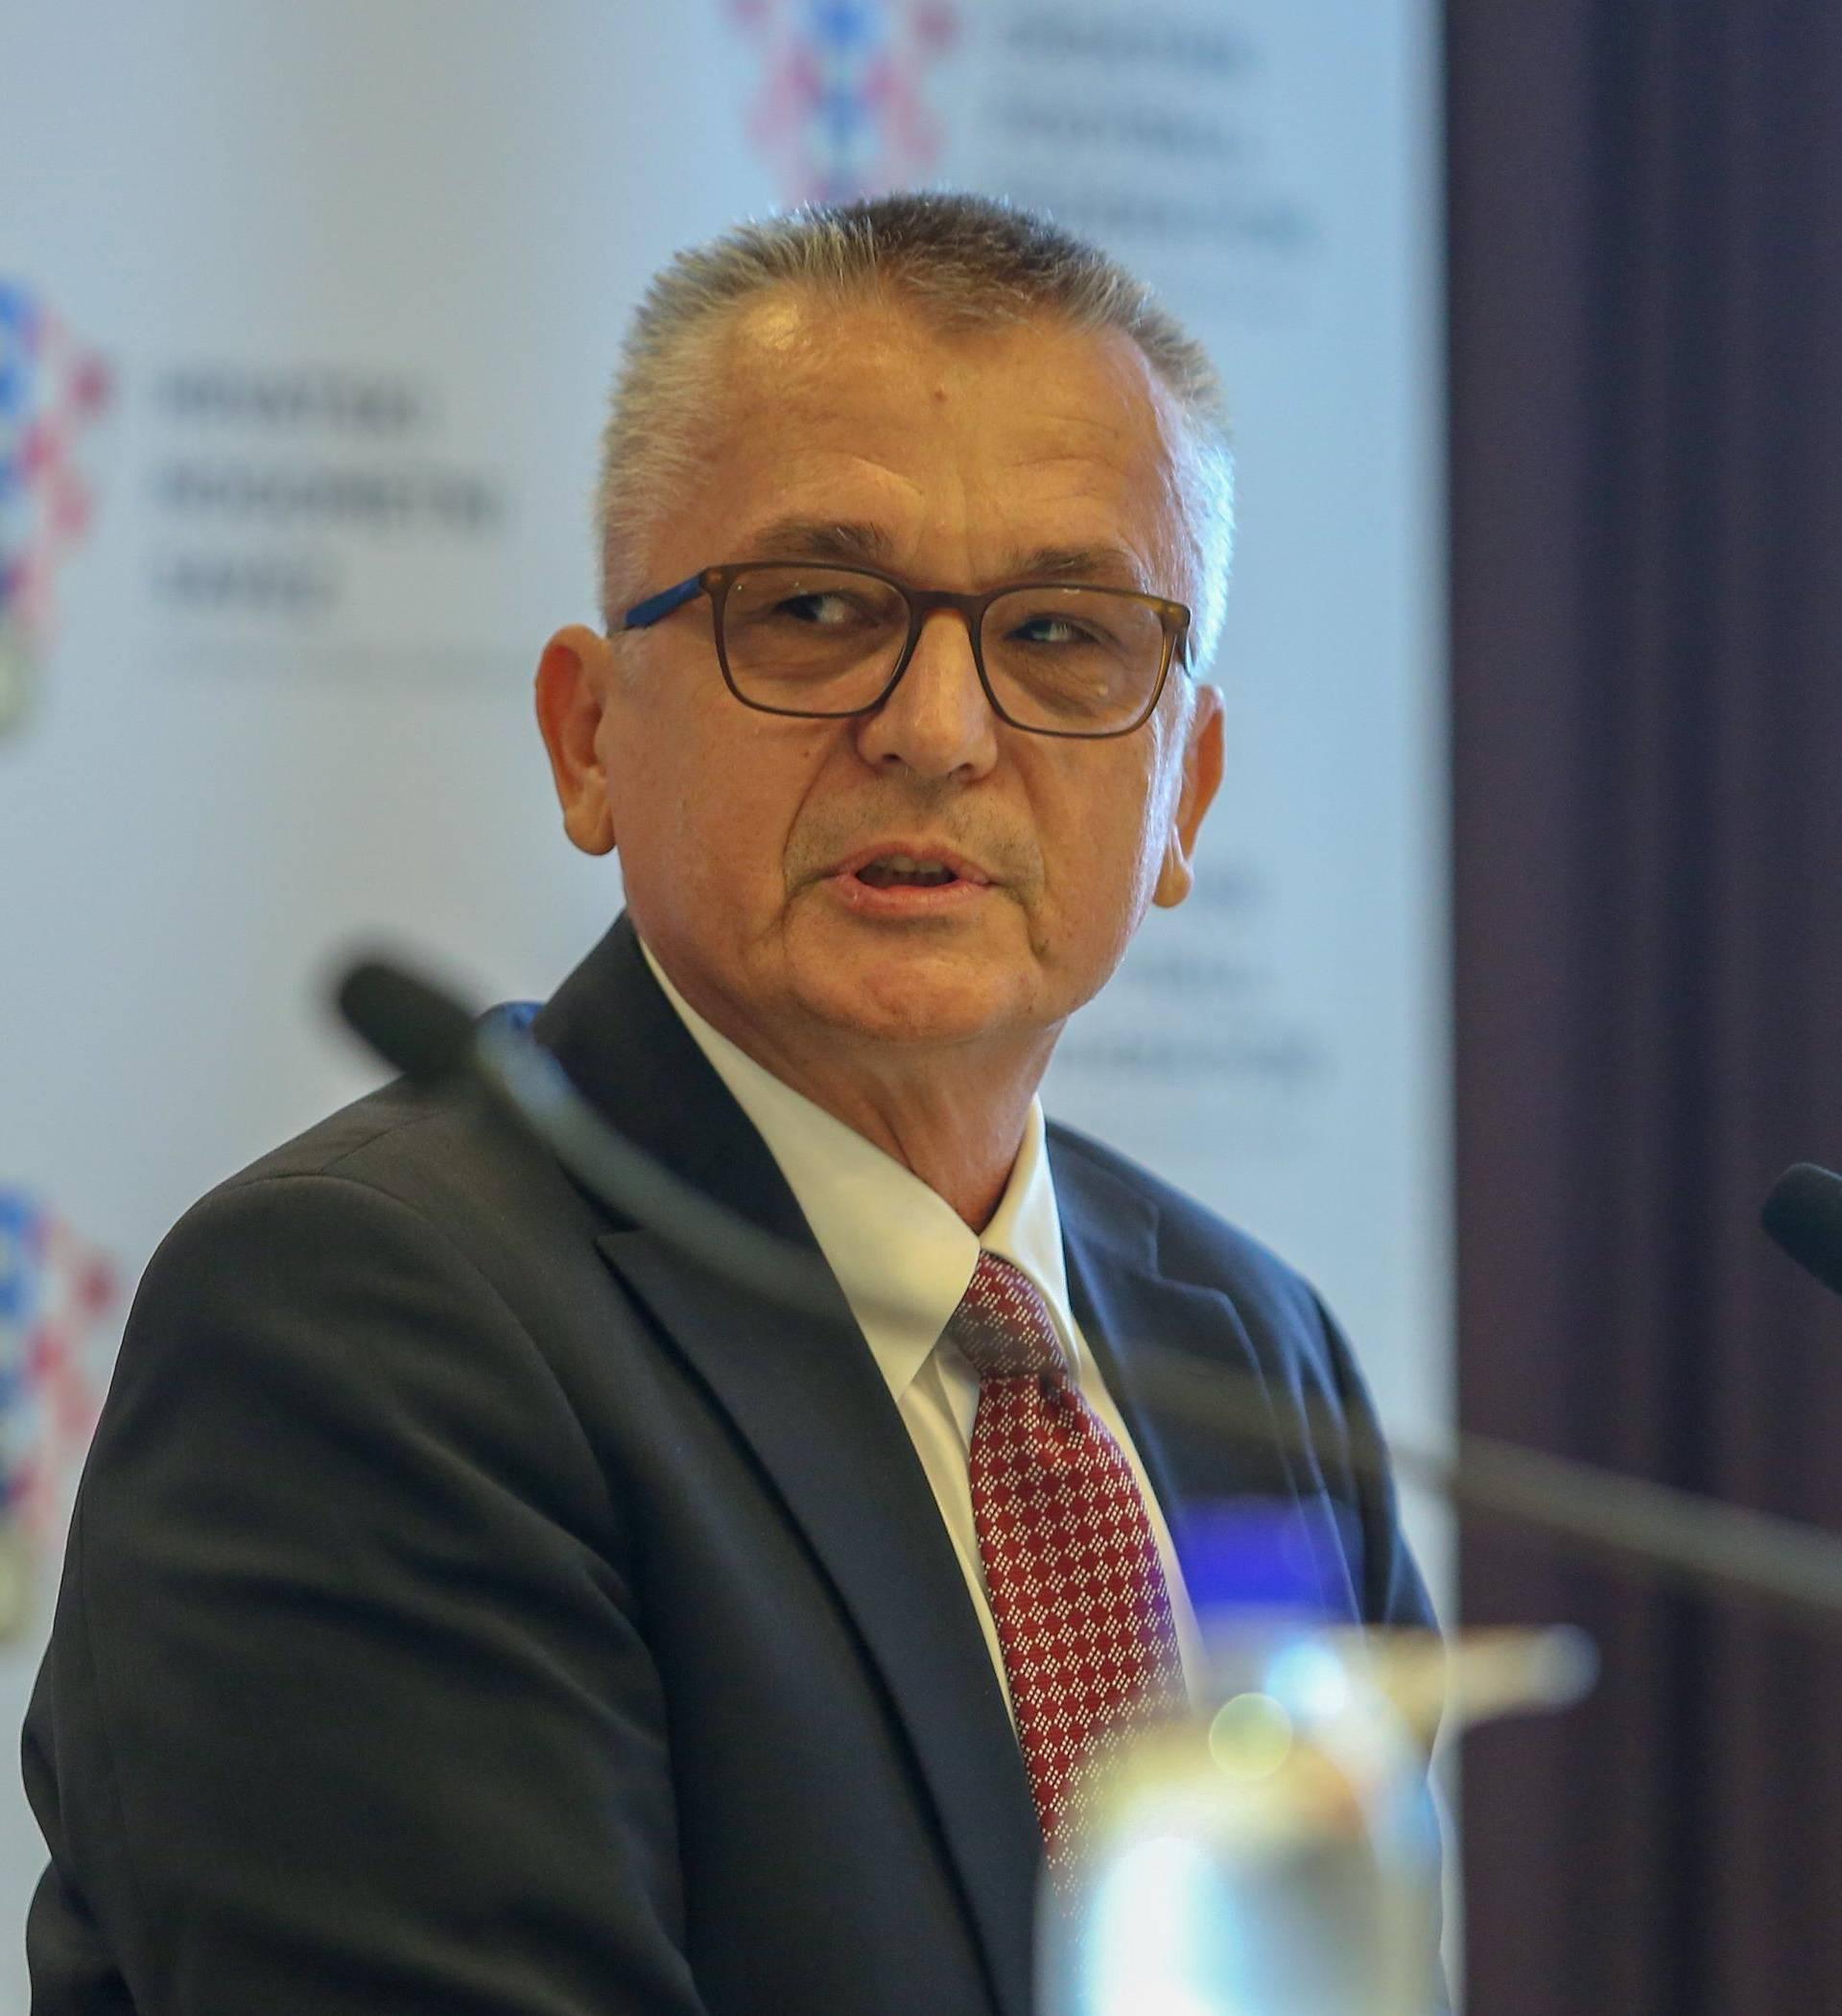 Zagreb: Svečano potpisan i ugovor između HNS-a i Croatia Airlinesa